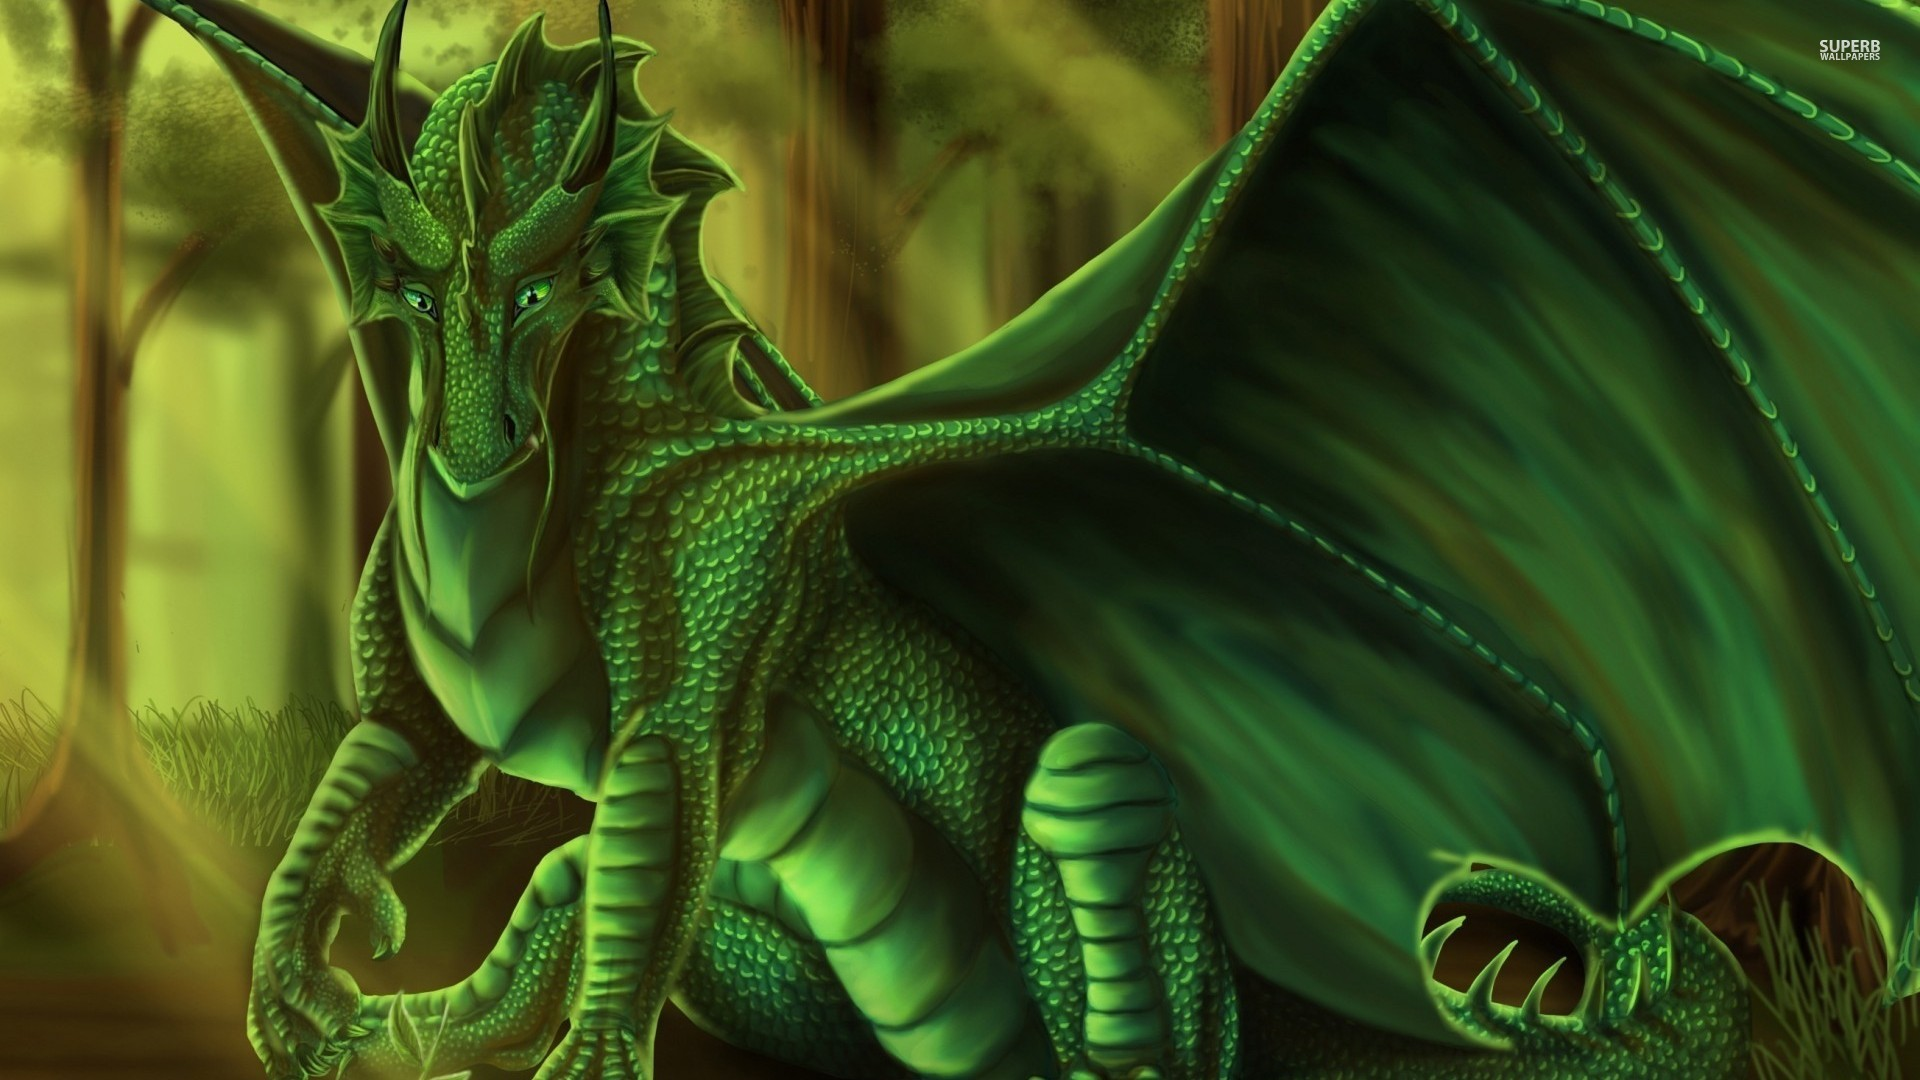 Green Dragon Wallpaper HD